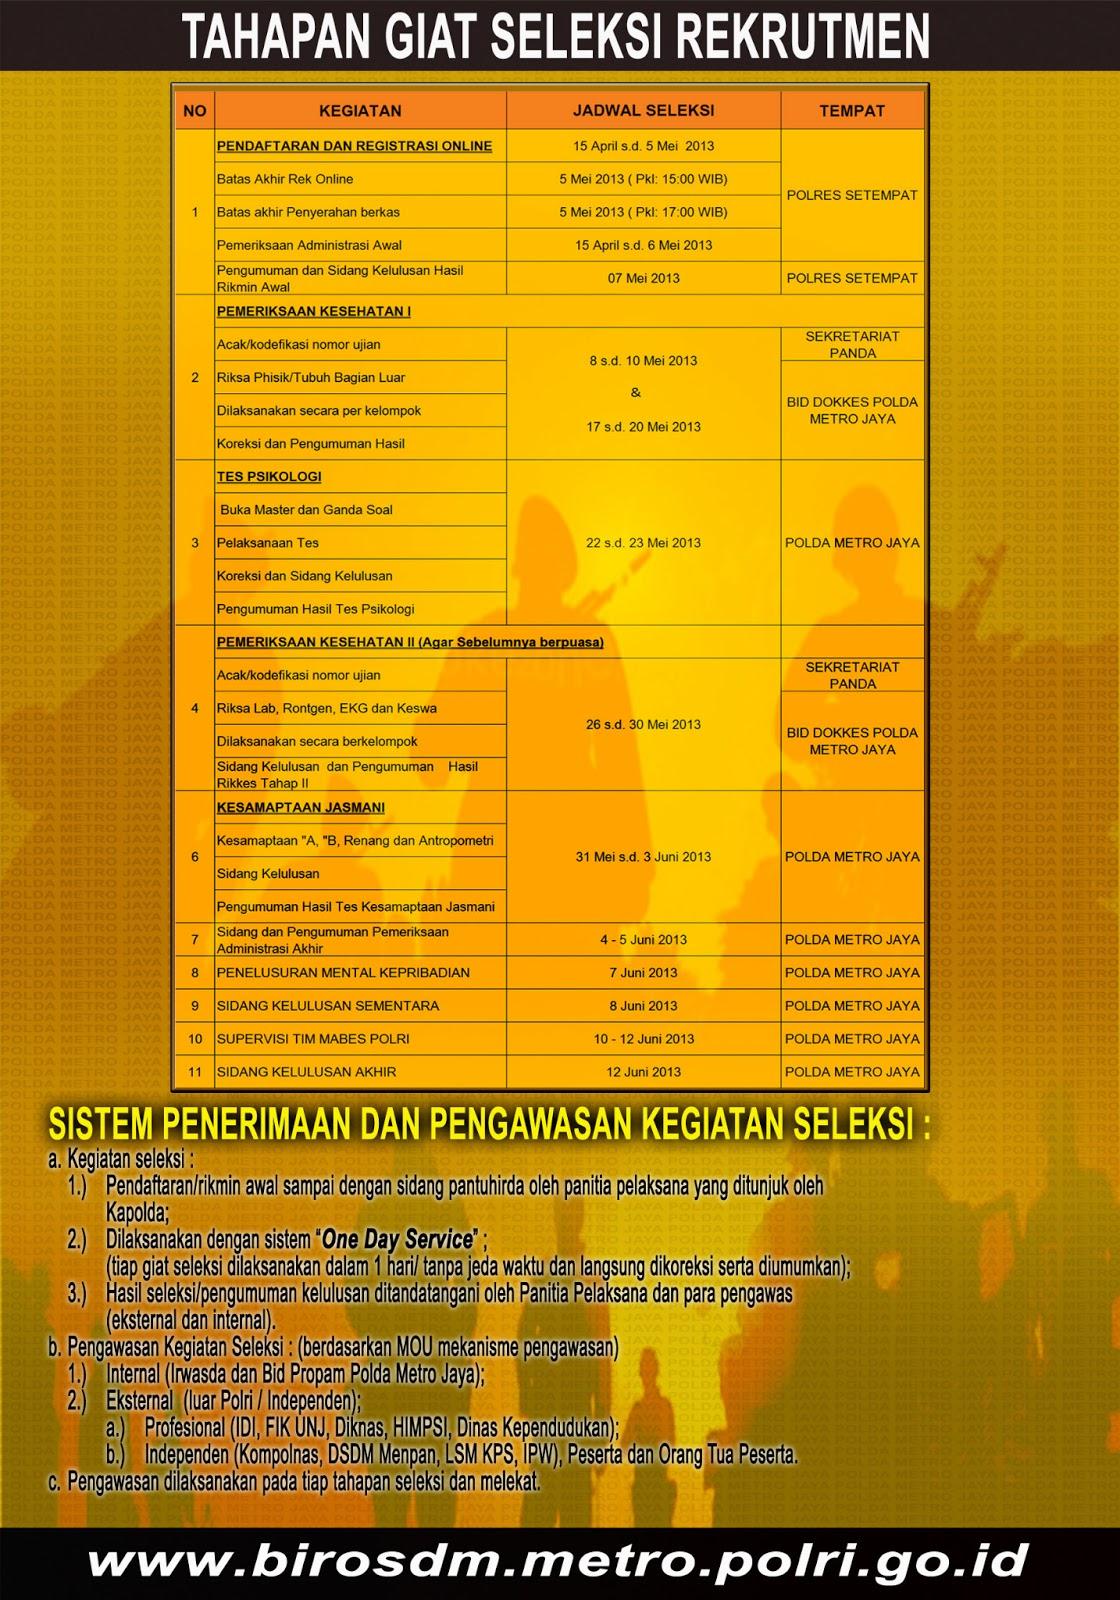 Pendaftaran Cpns 2013 Mojokerto Pengumuman Pendaftaran Bintara Pk Tni Ad Info Cpns 2016 Pengumuman Penerimaan Tamtama Brimob Polri T A 2013